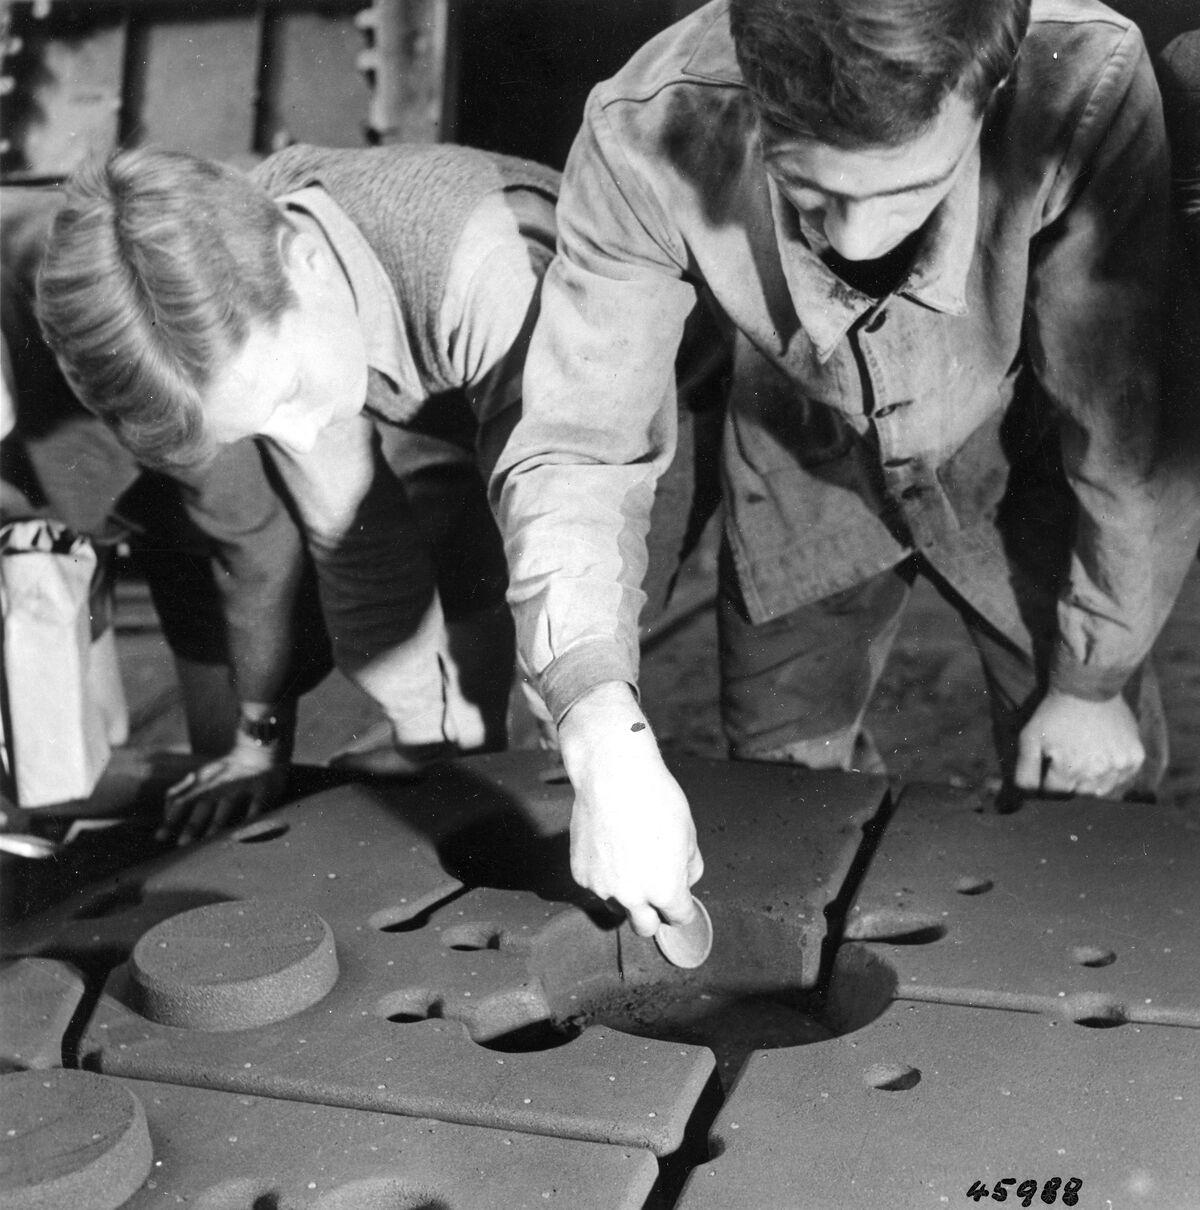 GFA 12/45988: Reportage casting process in malleable casting